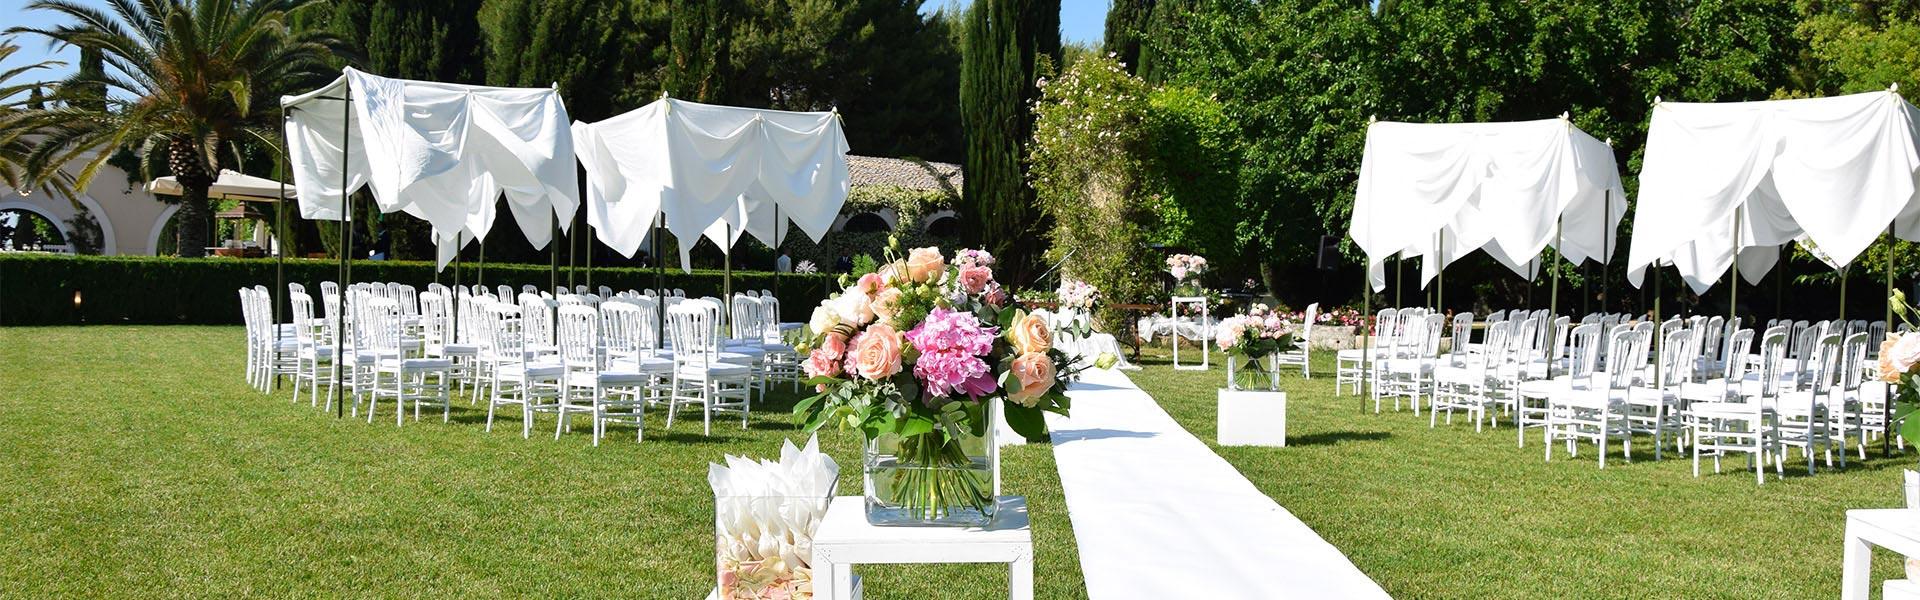 rito civile matrimonio giardino